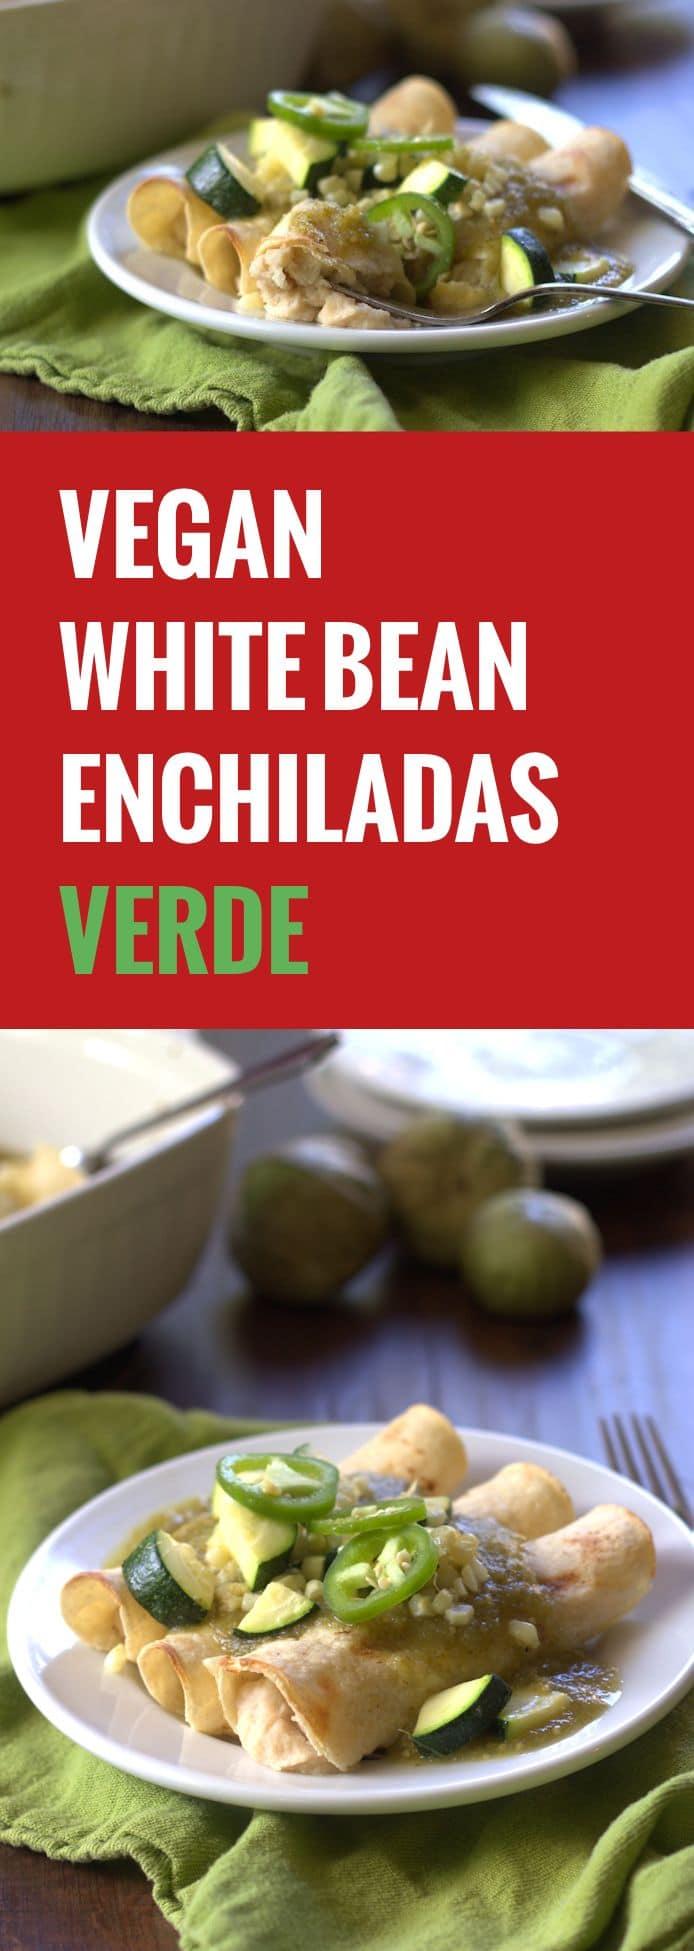 White Bean Enchiladas Verdes - Connoisseurus Veg